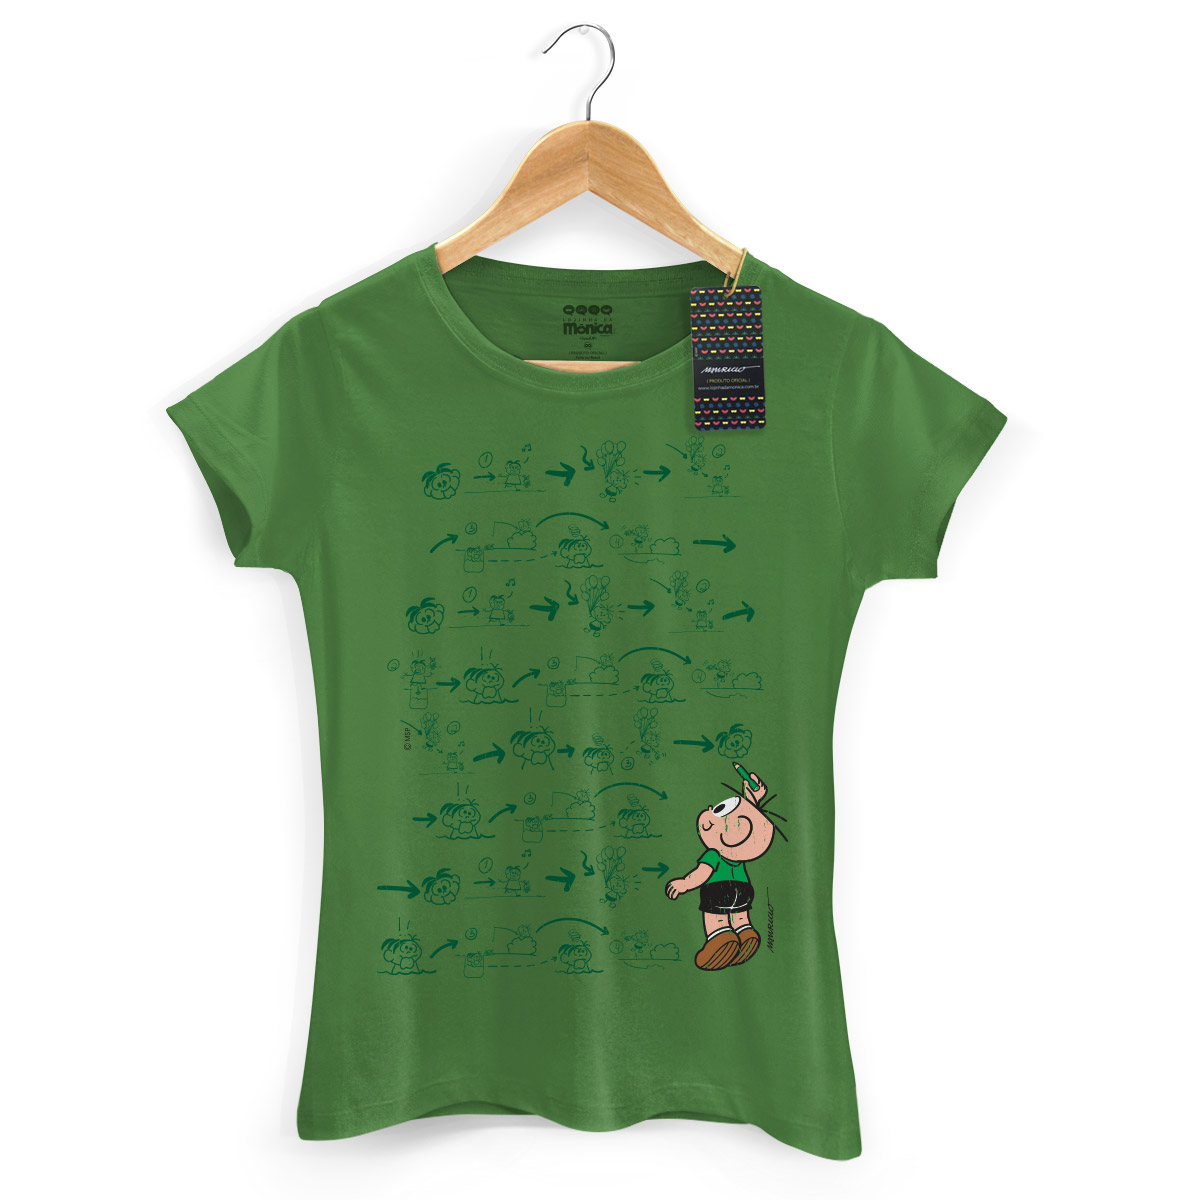 Camiseta Feminina Turma Da Mônica Cool Green Cebolinha